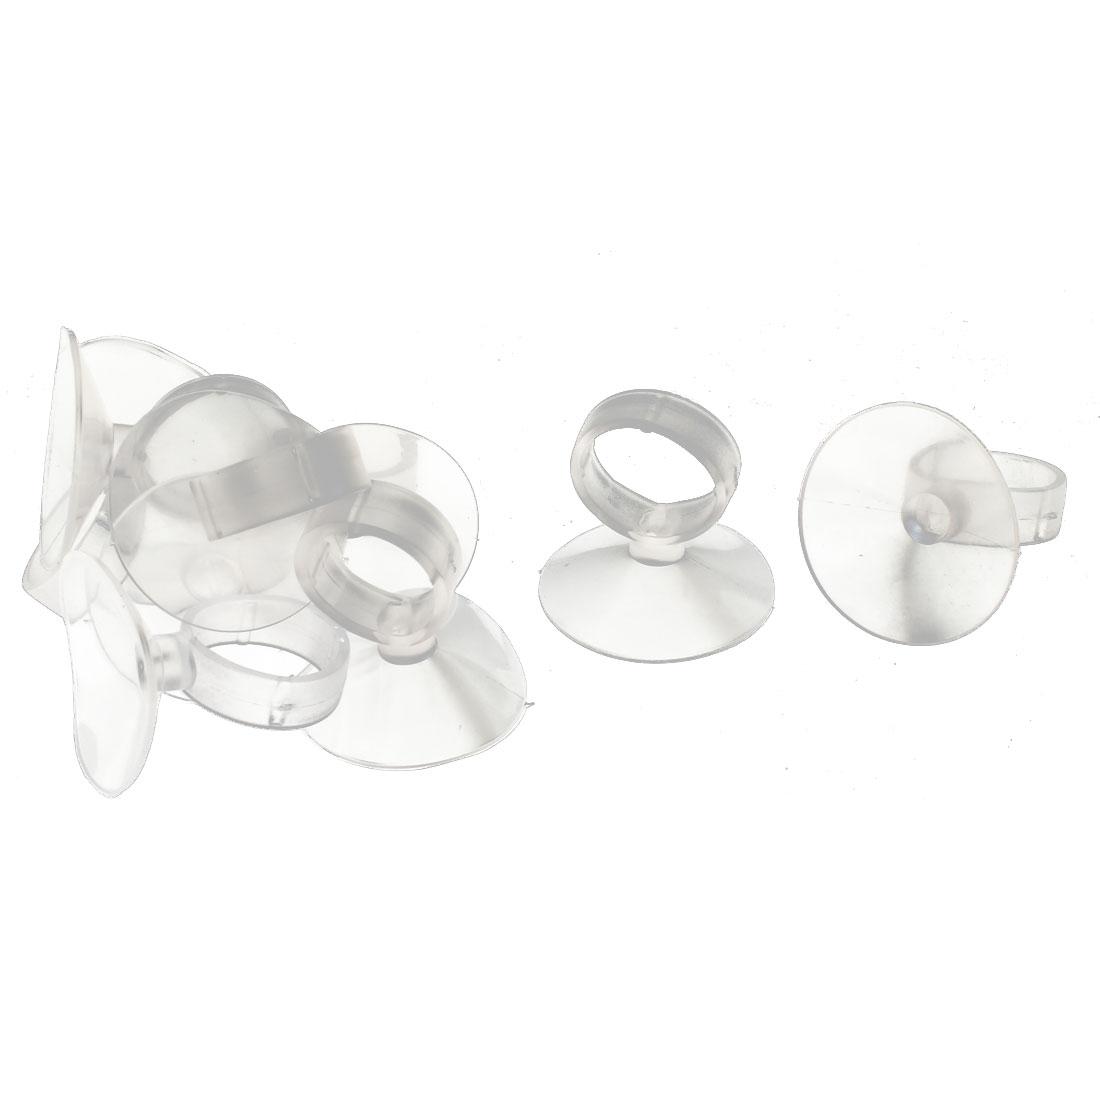 10 Pcs 45mm Dia Clear Plastic Aquarium Fish Bowl Air Line Tube Hose Suction Cup Holders